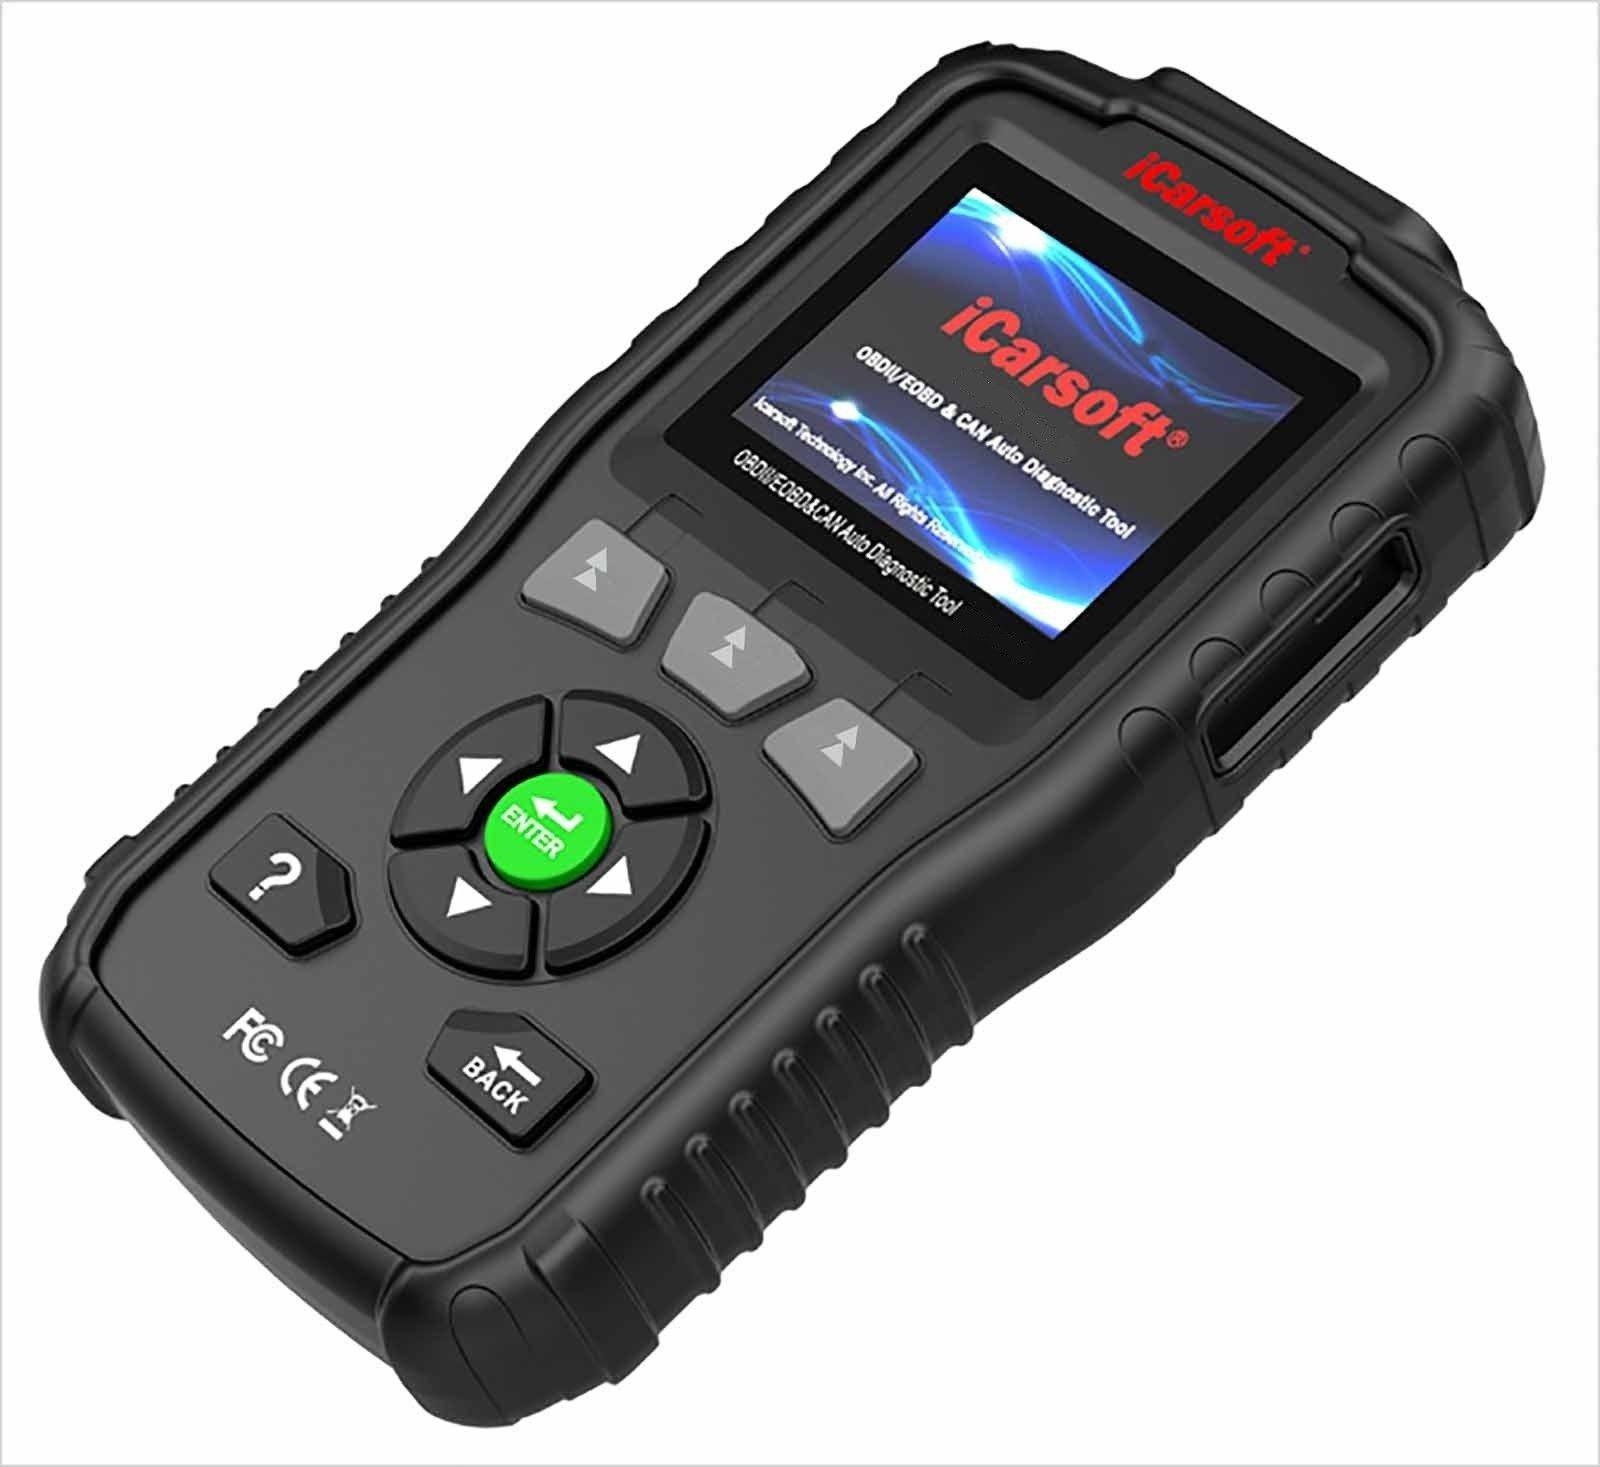 Used MERCEDES BENZ Diagnostic Scanner Tool Code Reader CLS